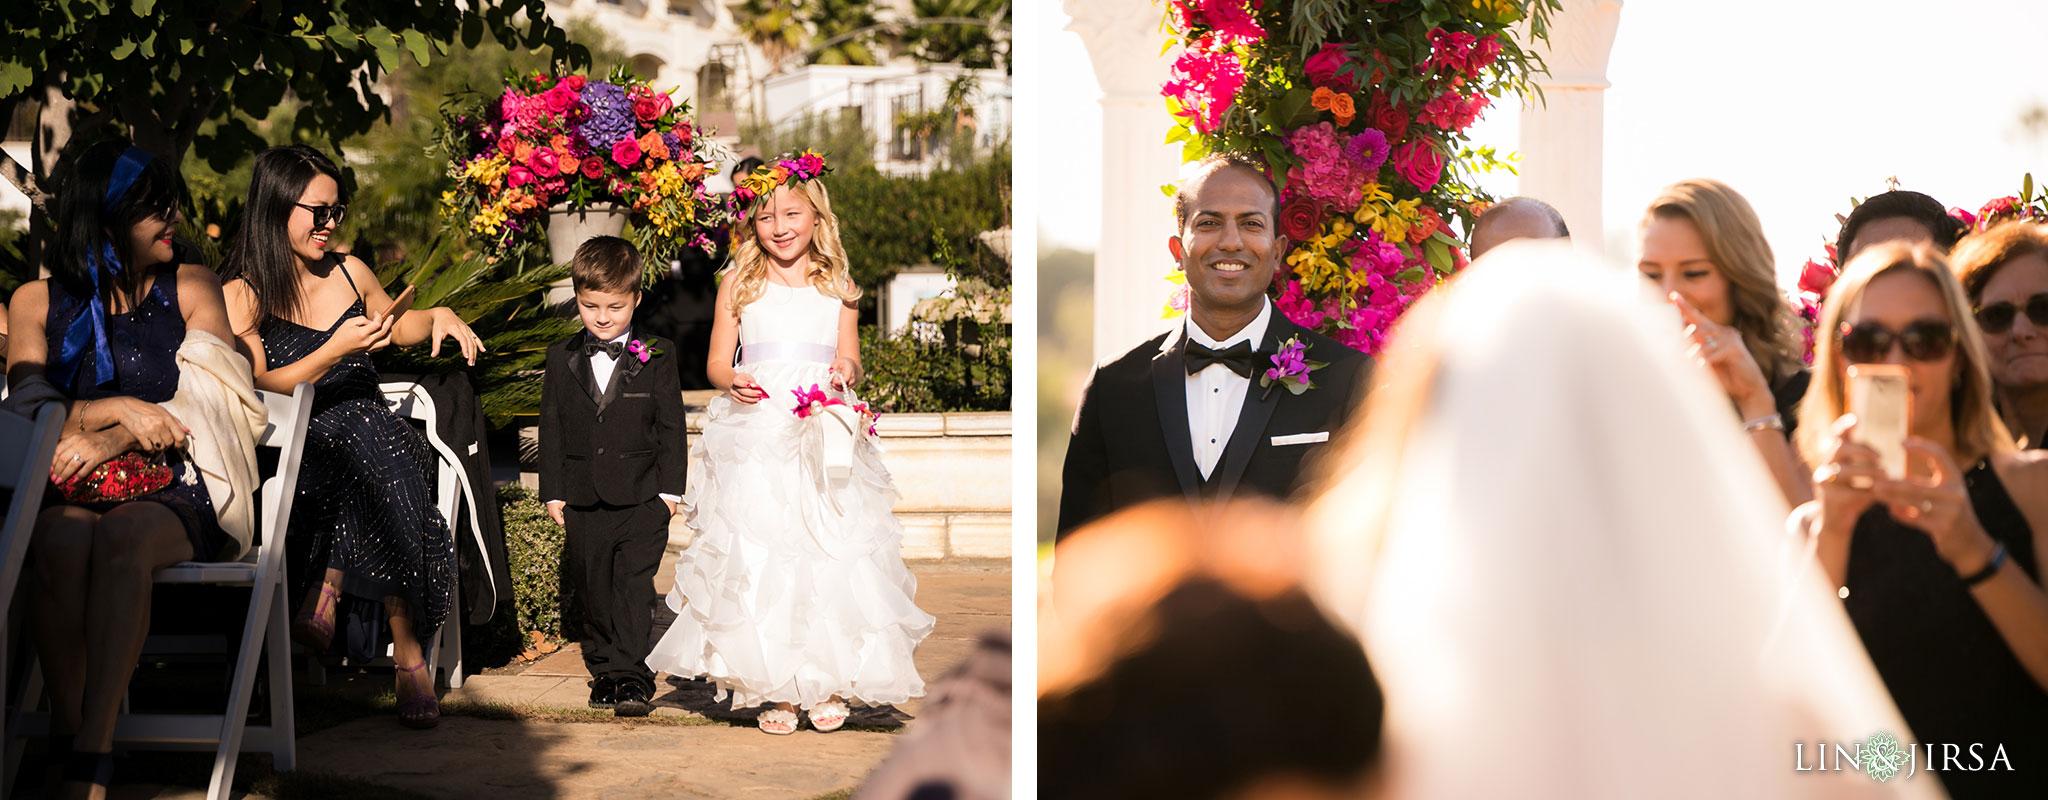 19 monarch beach resort wedding ceremony photography